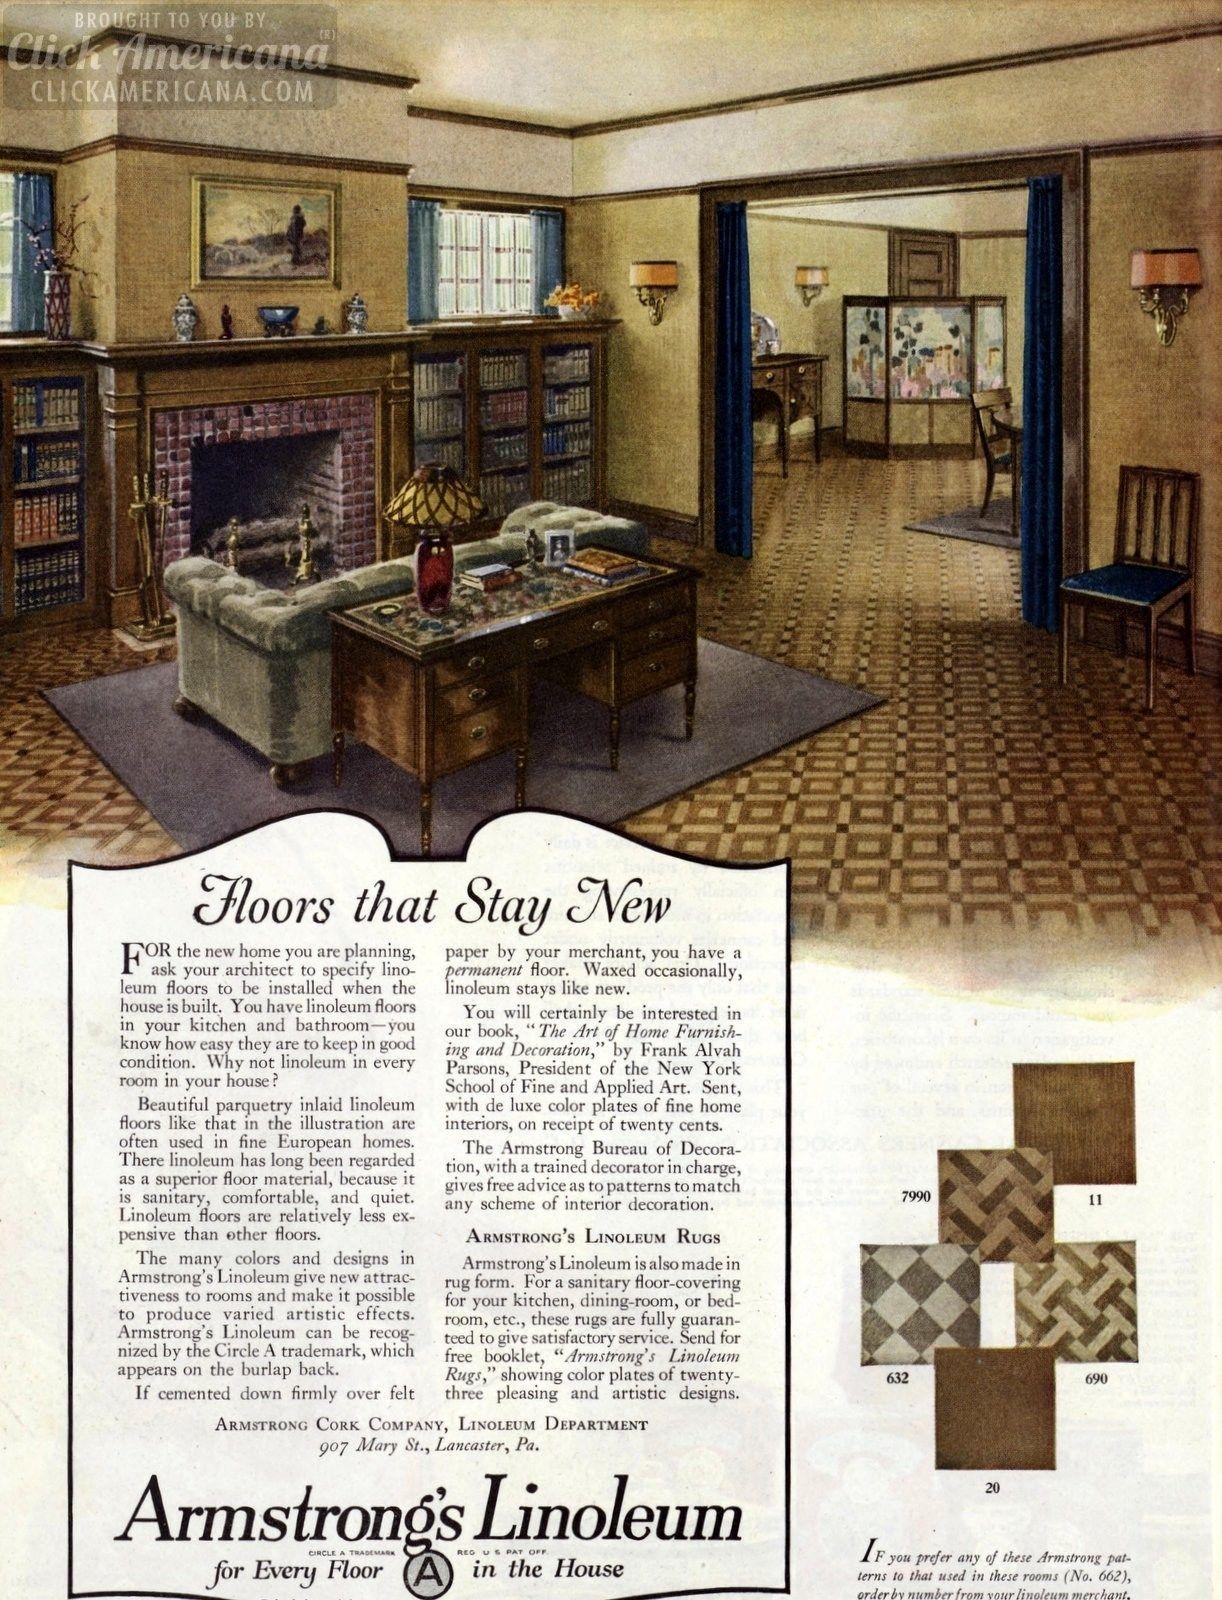 1924 Floral Bedroom Design Inspiration From 20s Bedroom Vintage Bedroom Design Inspiration Vintage Bedroom Decor